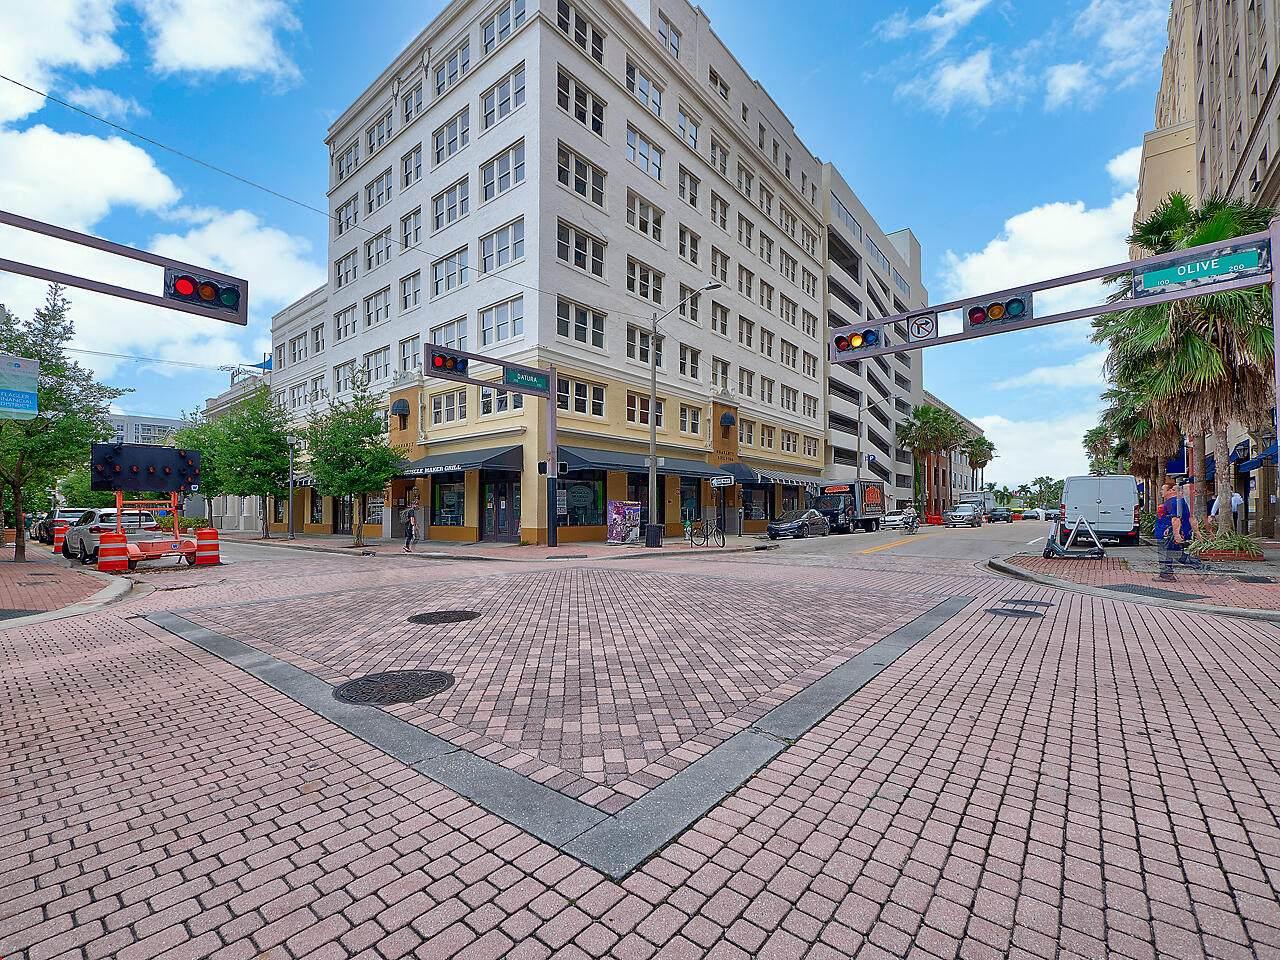 120 Olive Avenue - Photo 1